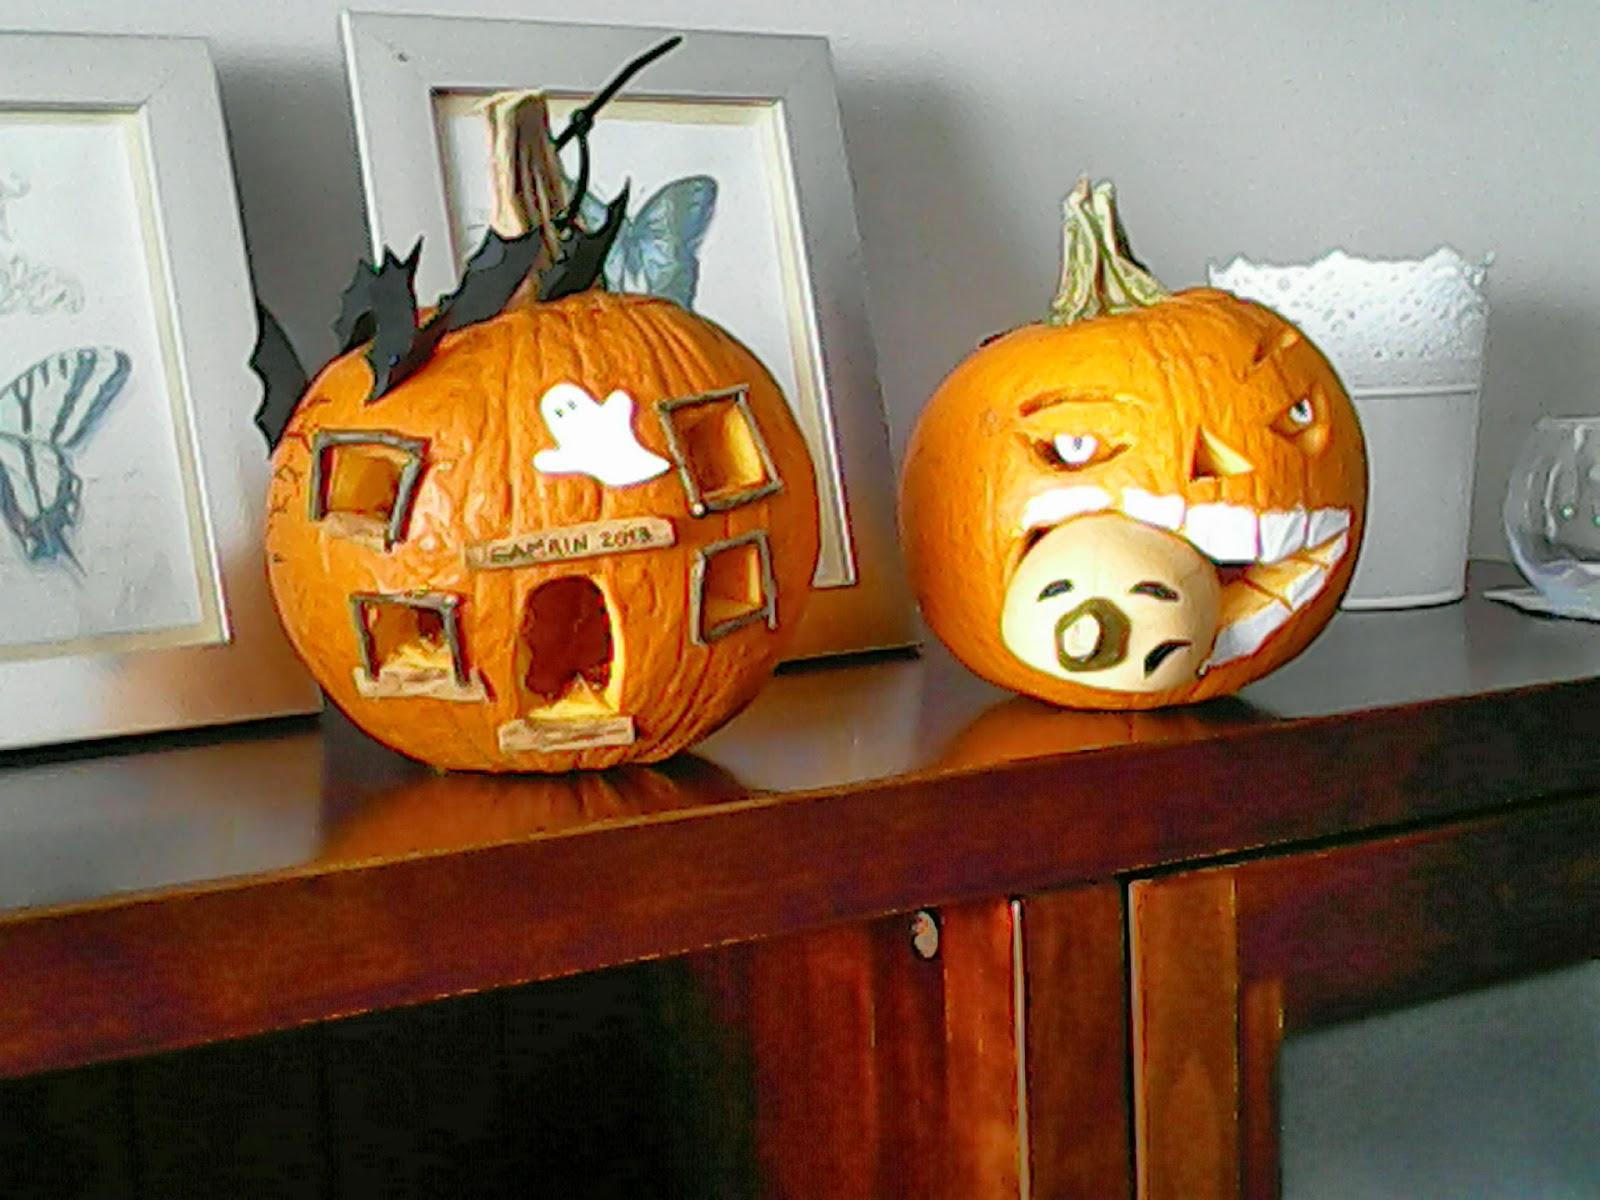 Calabazas decoradas de halloween cosas de mam s y peques for Puertas decoradas halloween calabaza